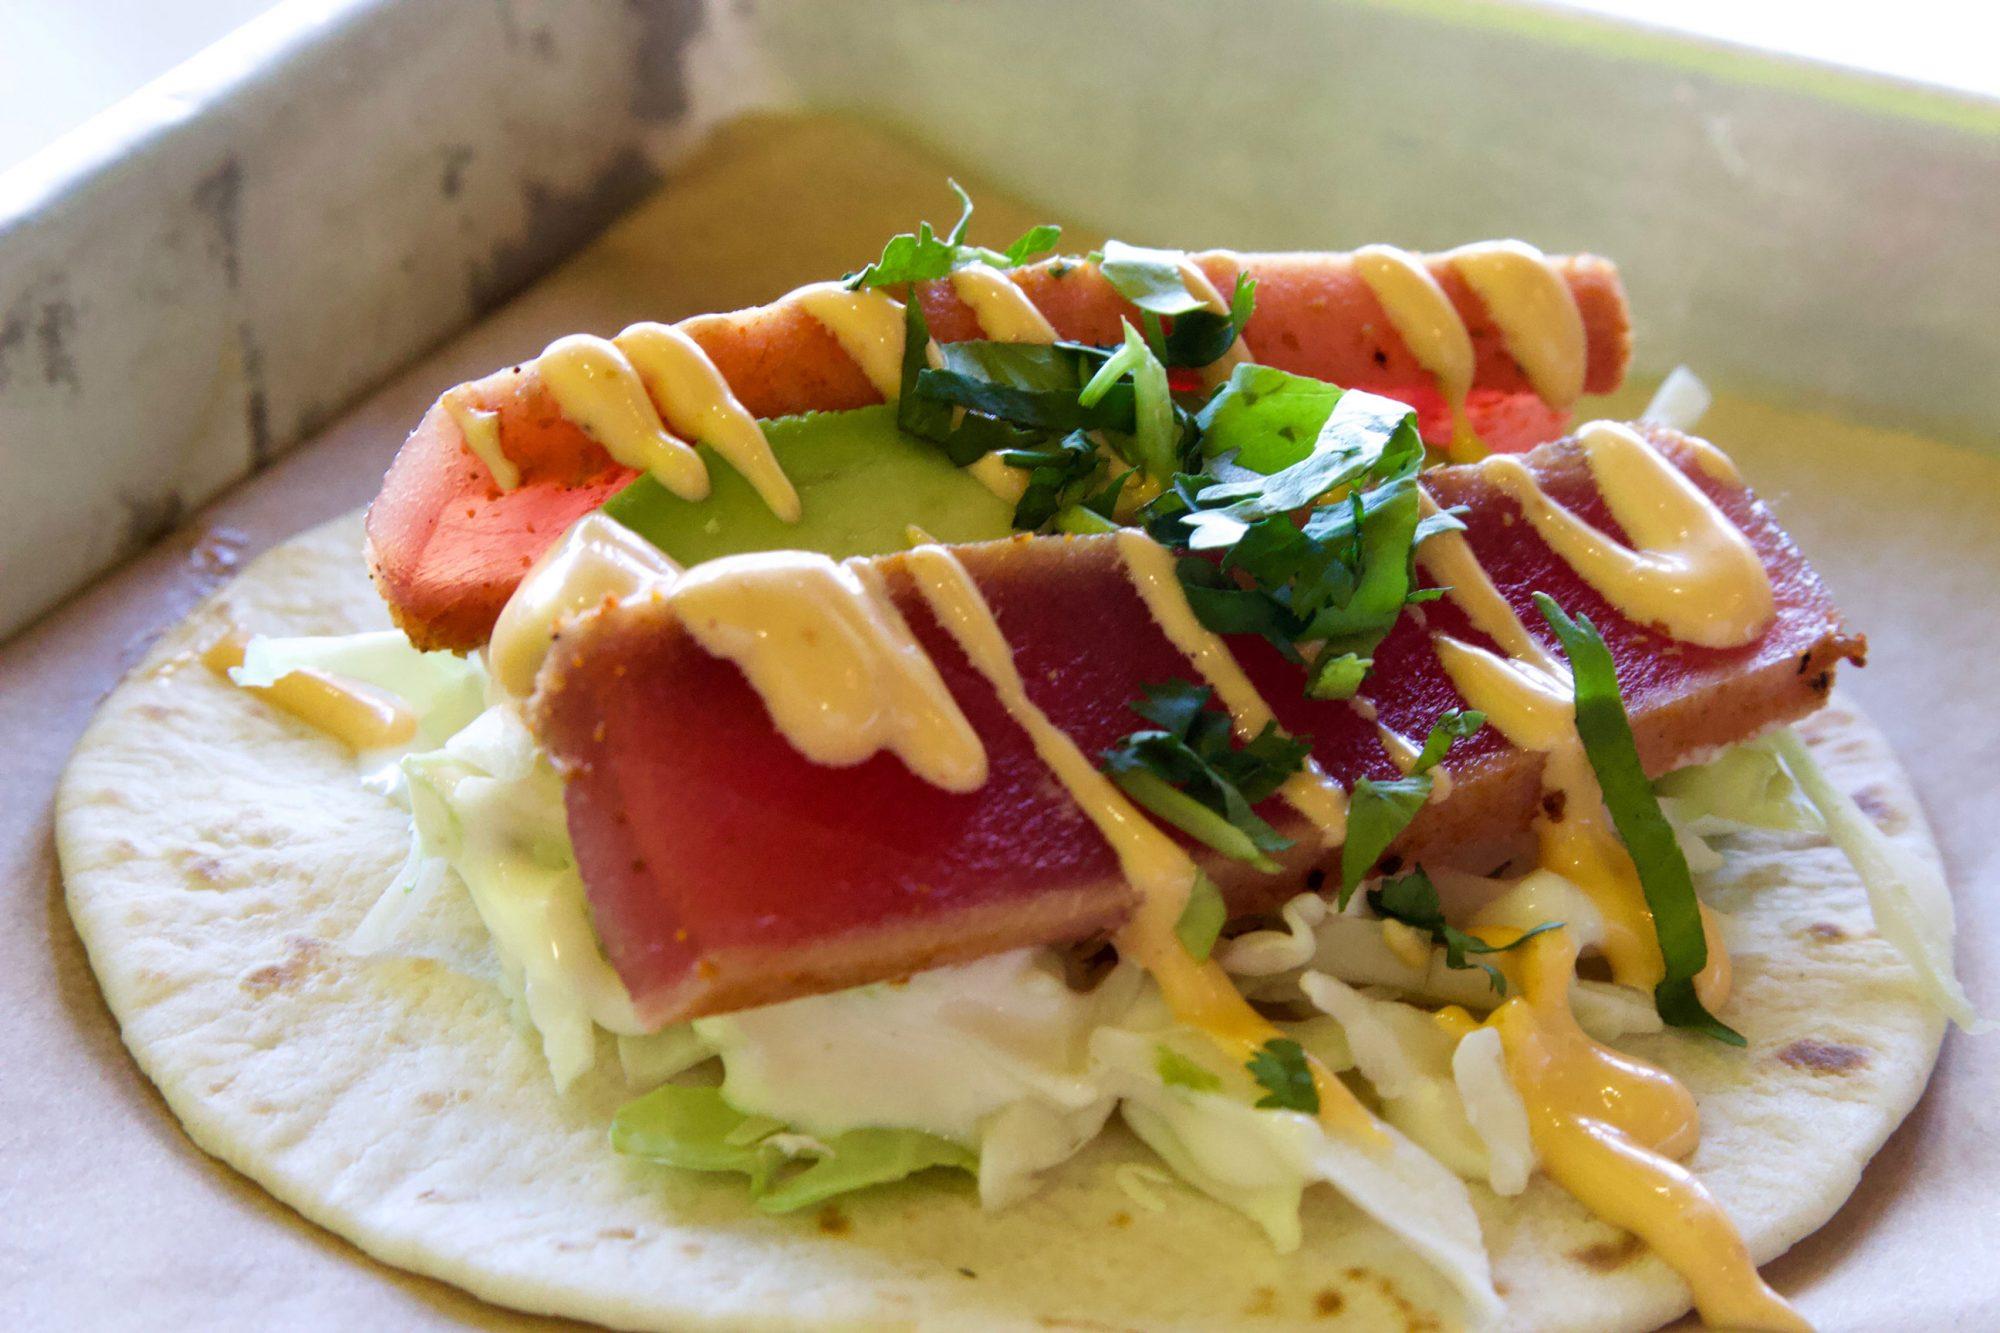 Jefes Tacos Tequila Longmont Restaurant Tacos More